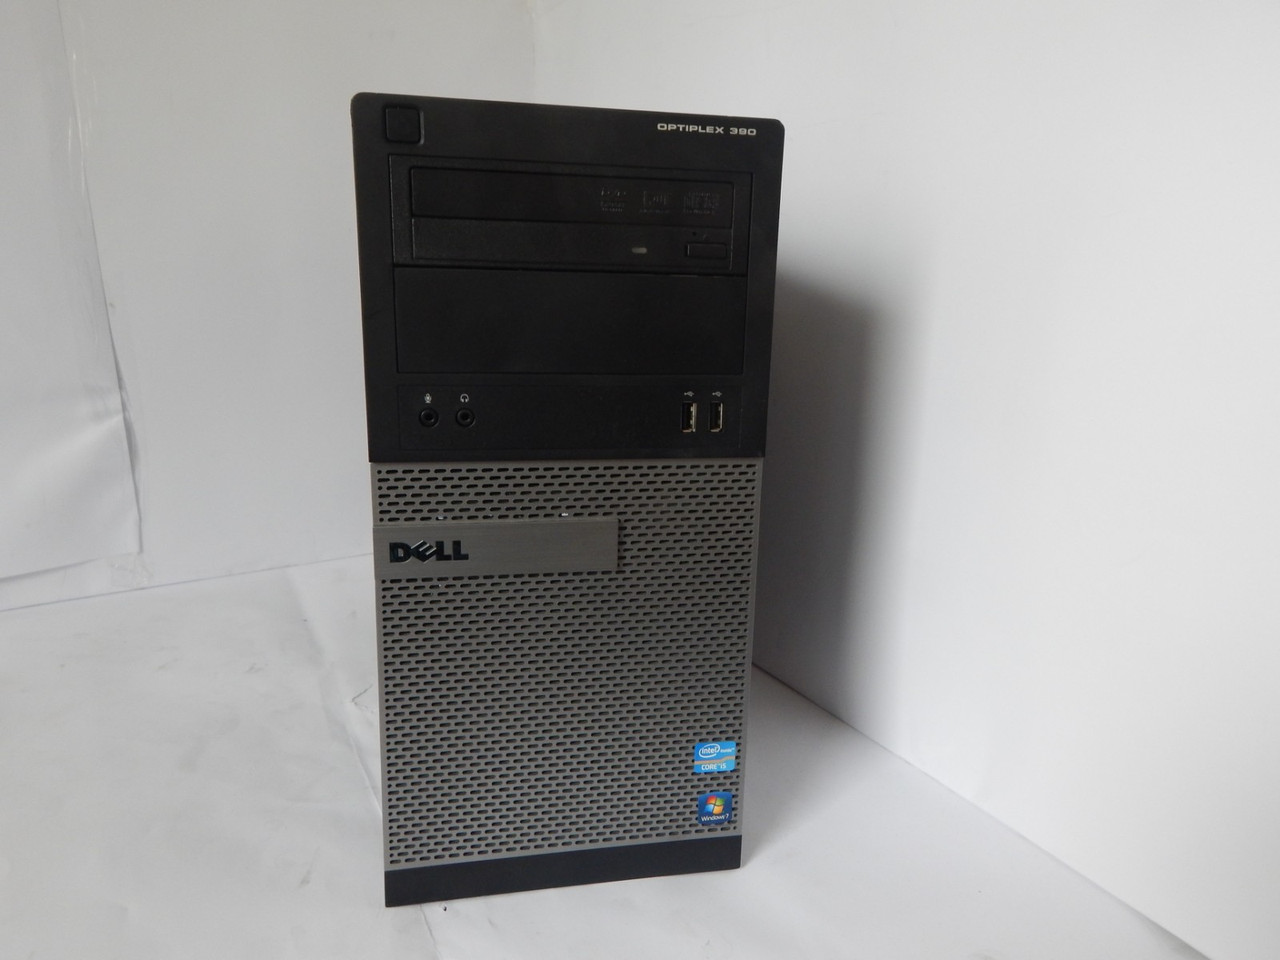 Системний блок Dell 3010 i3-3220 4RAM USB 3.0 Сокет 1155 компьютер